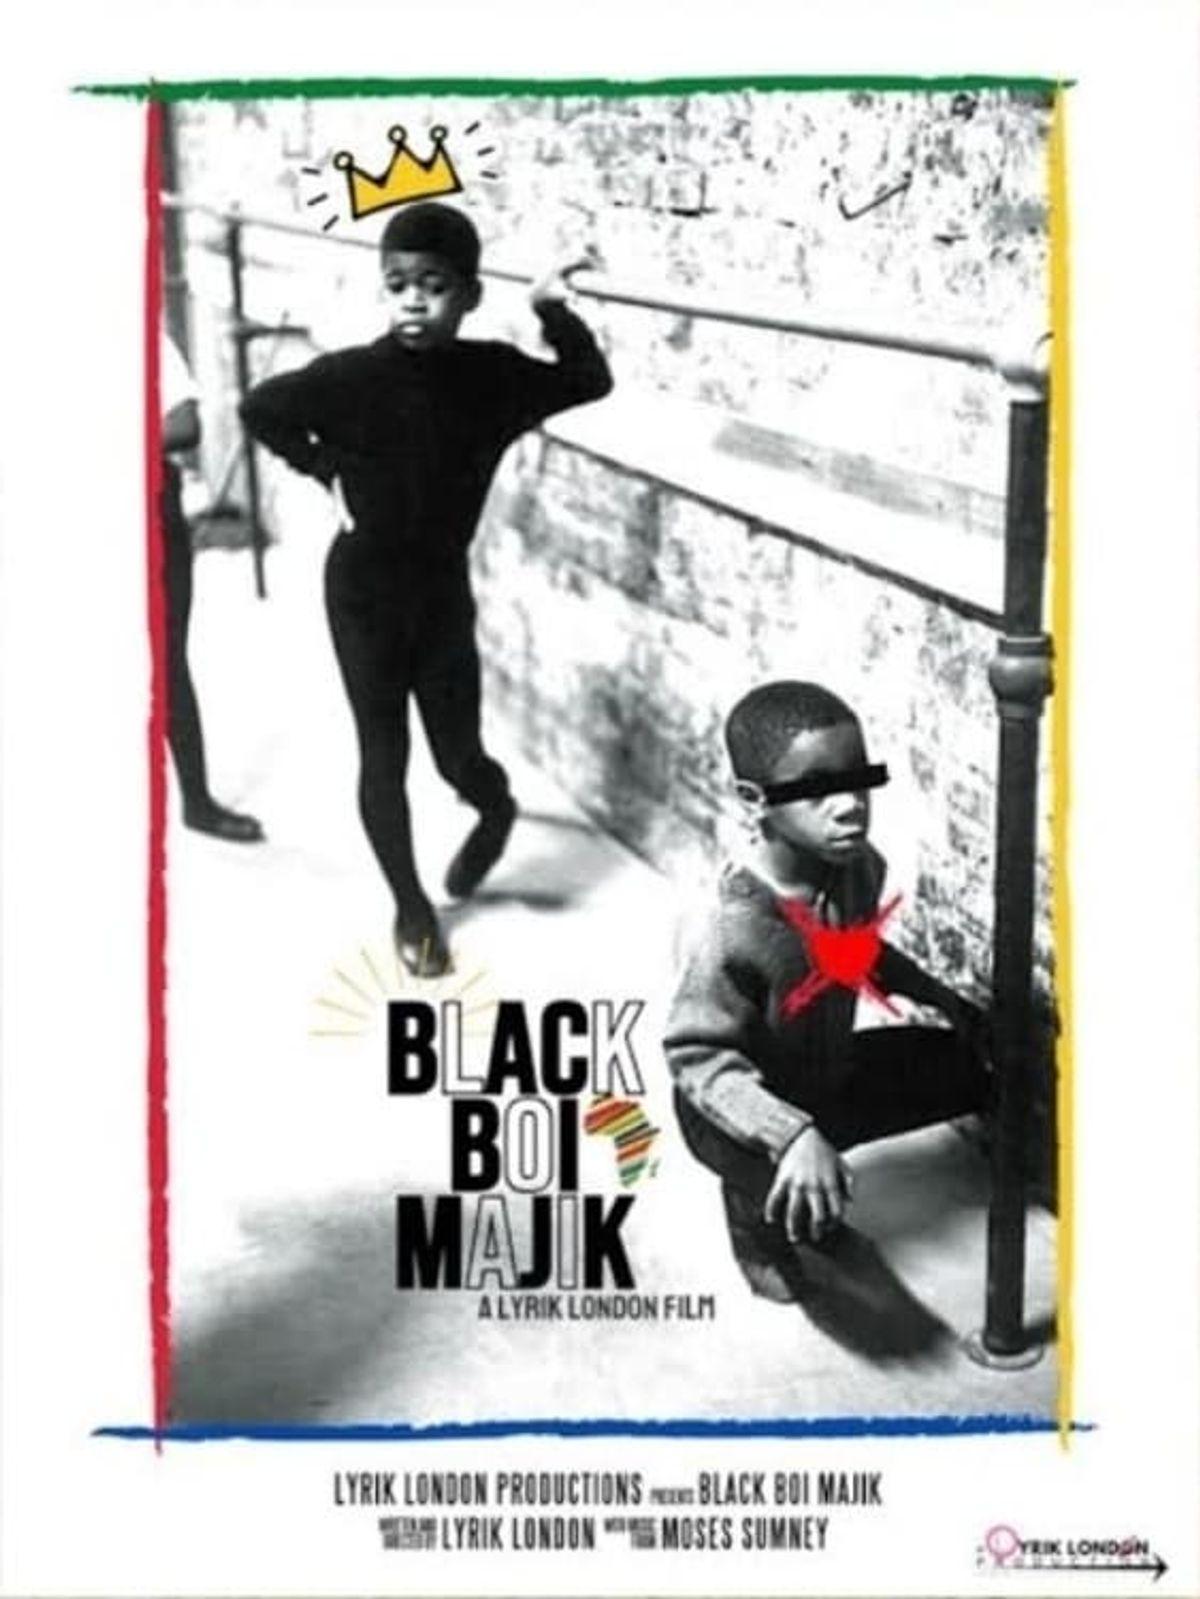 Black Boi Majik